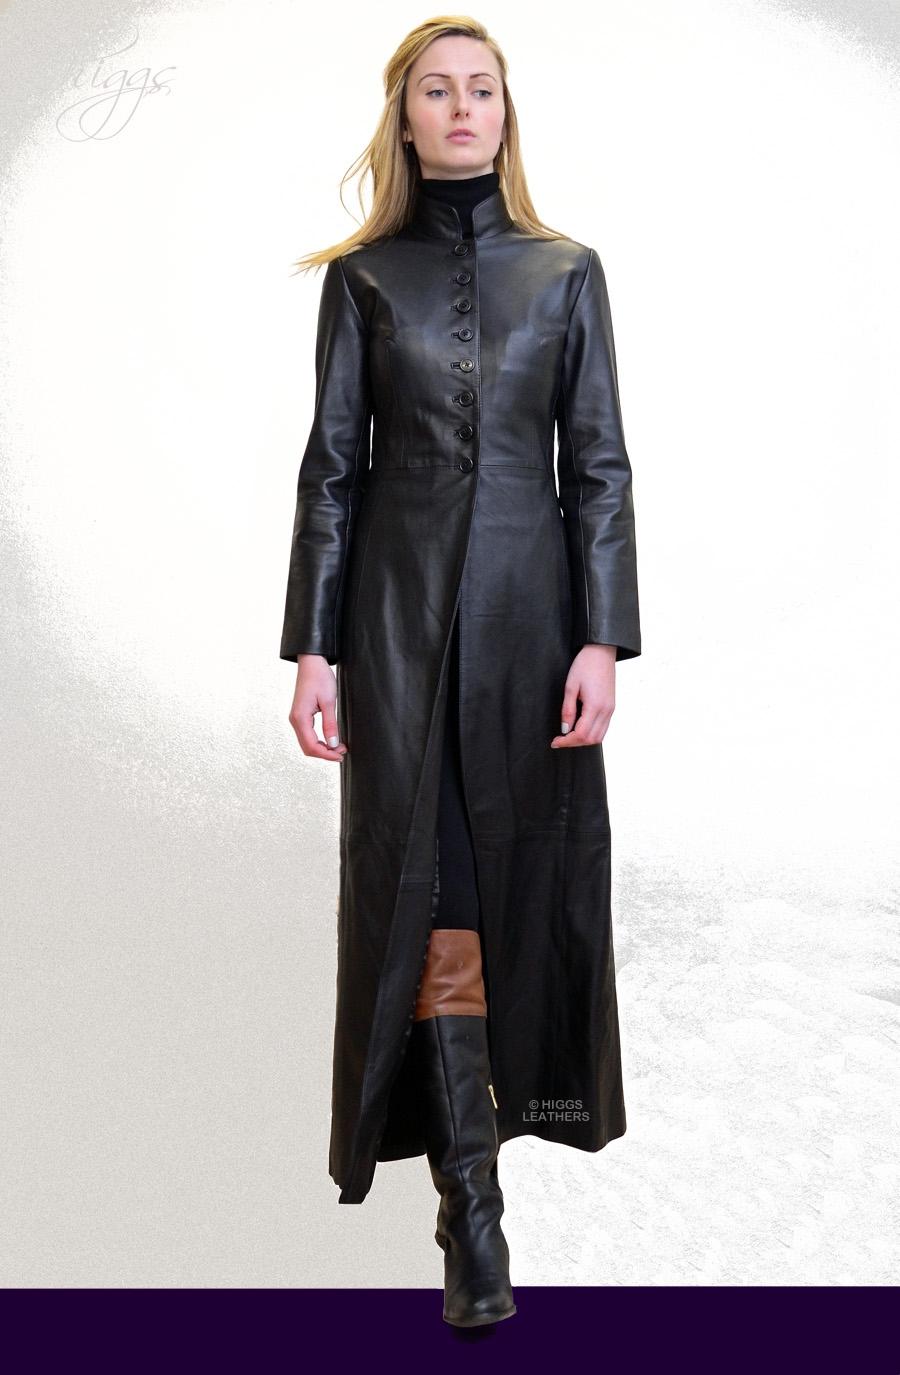 Higgs Leathers Buy Trinity Ladies Long Black Leather Coat Online